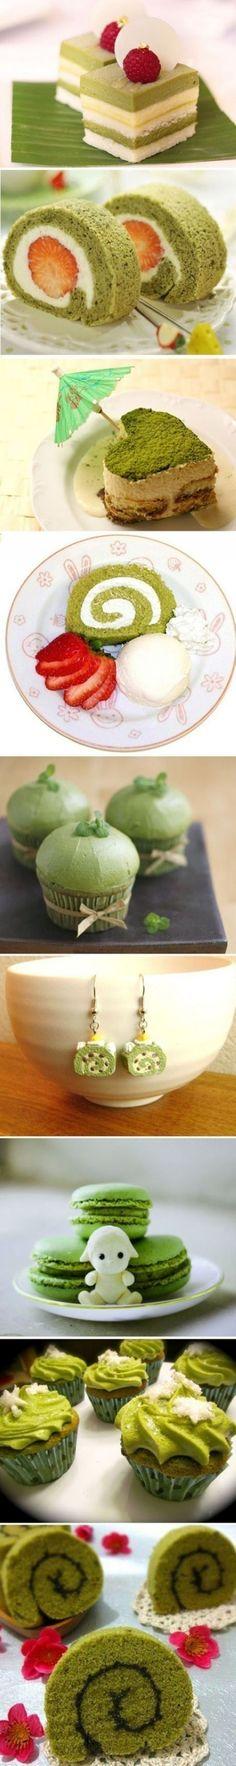 Matcha cakes that are amazing! Green Desserts, Green Tea Recipes, Sweet Recipes, Cupcakes, Cupcake Cakes, Golden Trio, Matcha Cake, Japanese Sweets, Matcha Green Tea